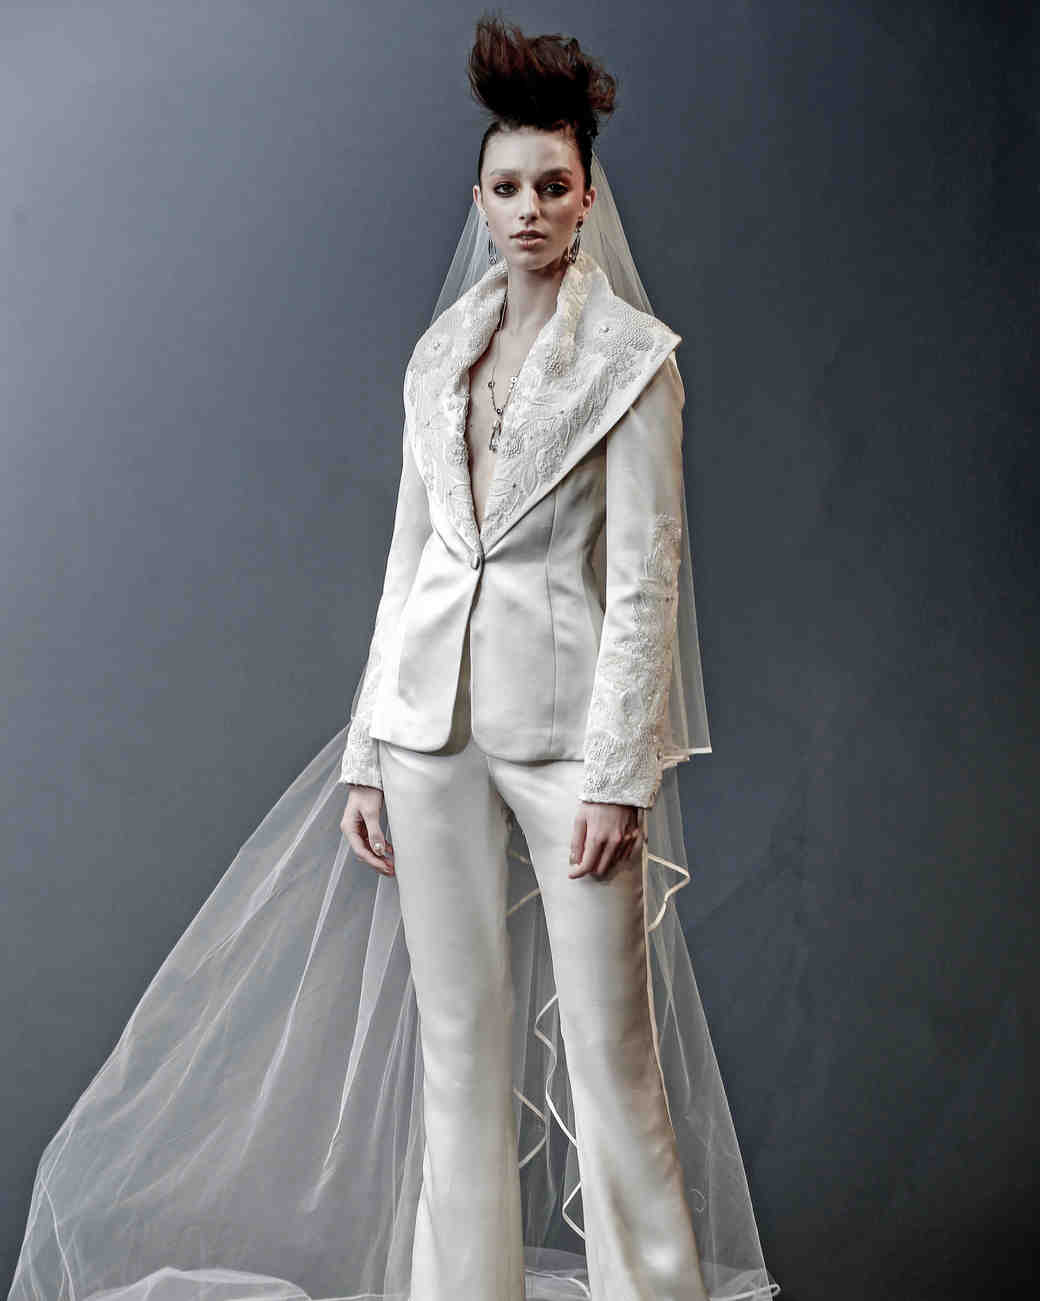 Winter Wedding Pant Suits  Invitationsjdiorg